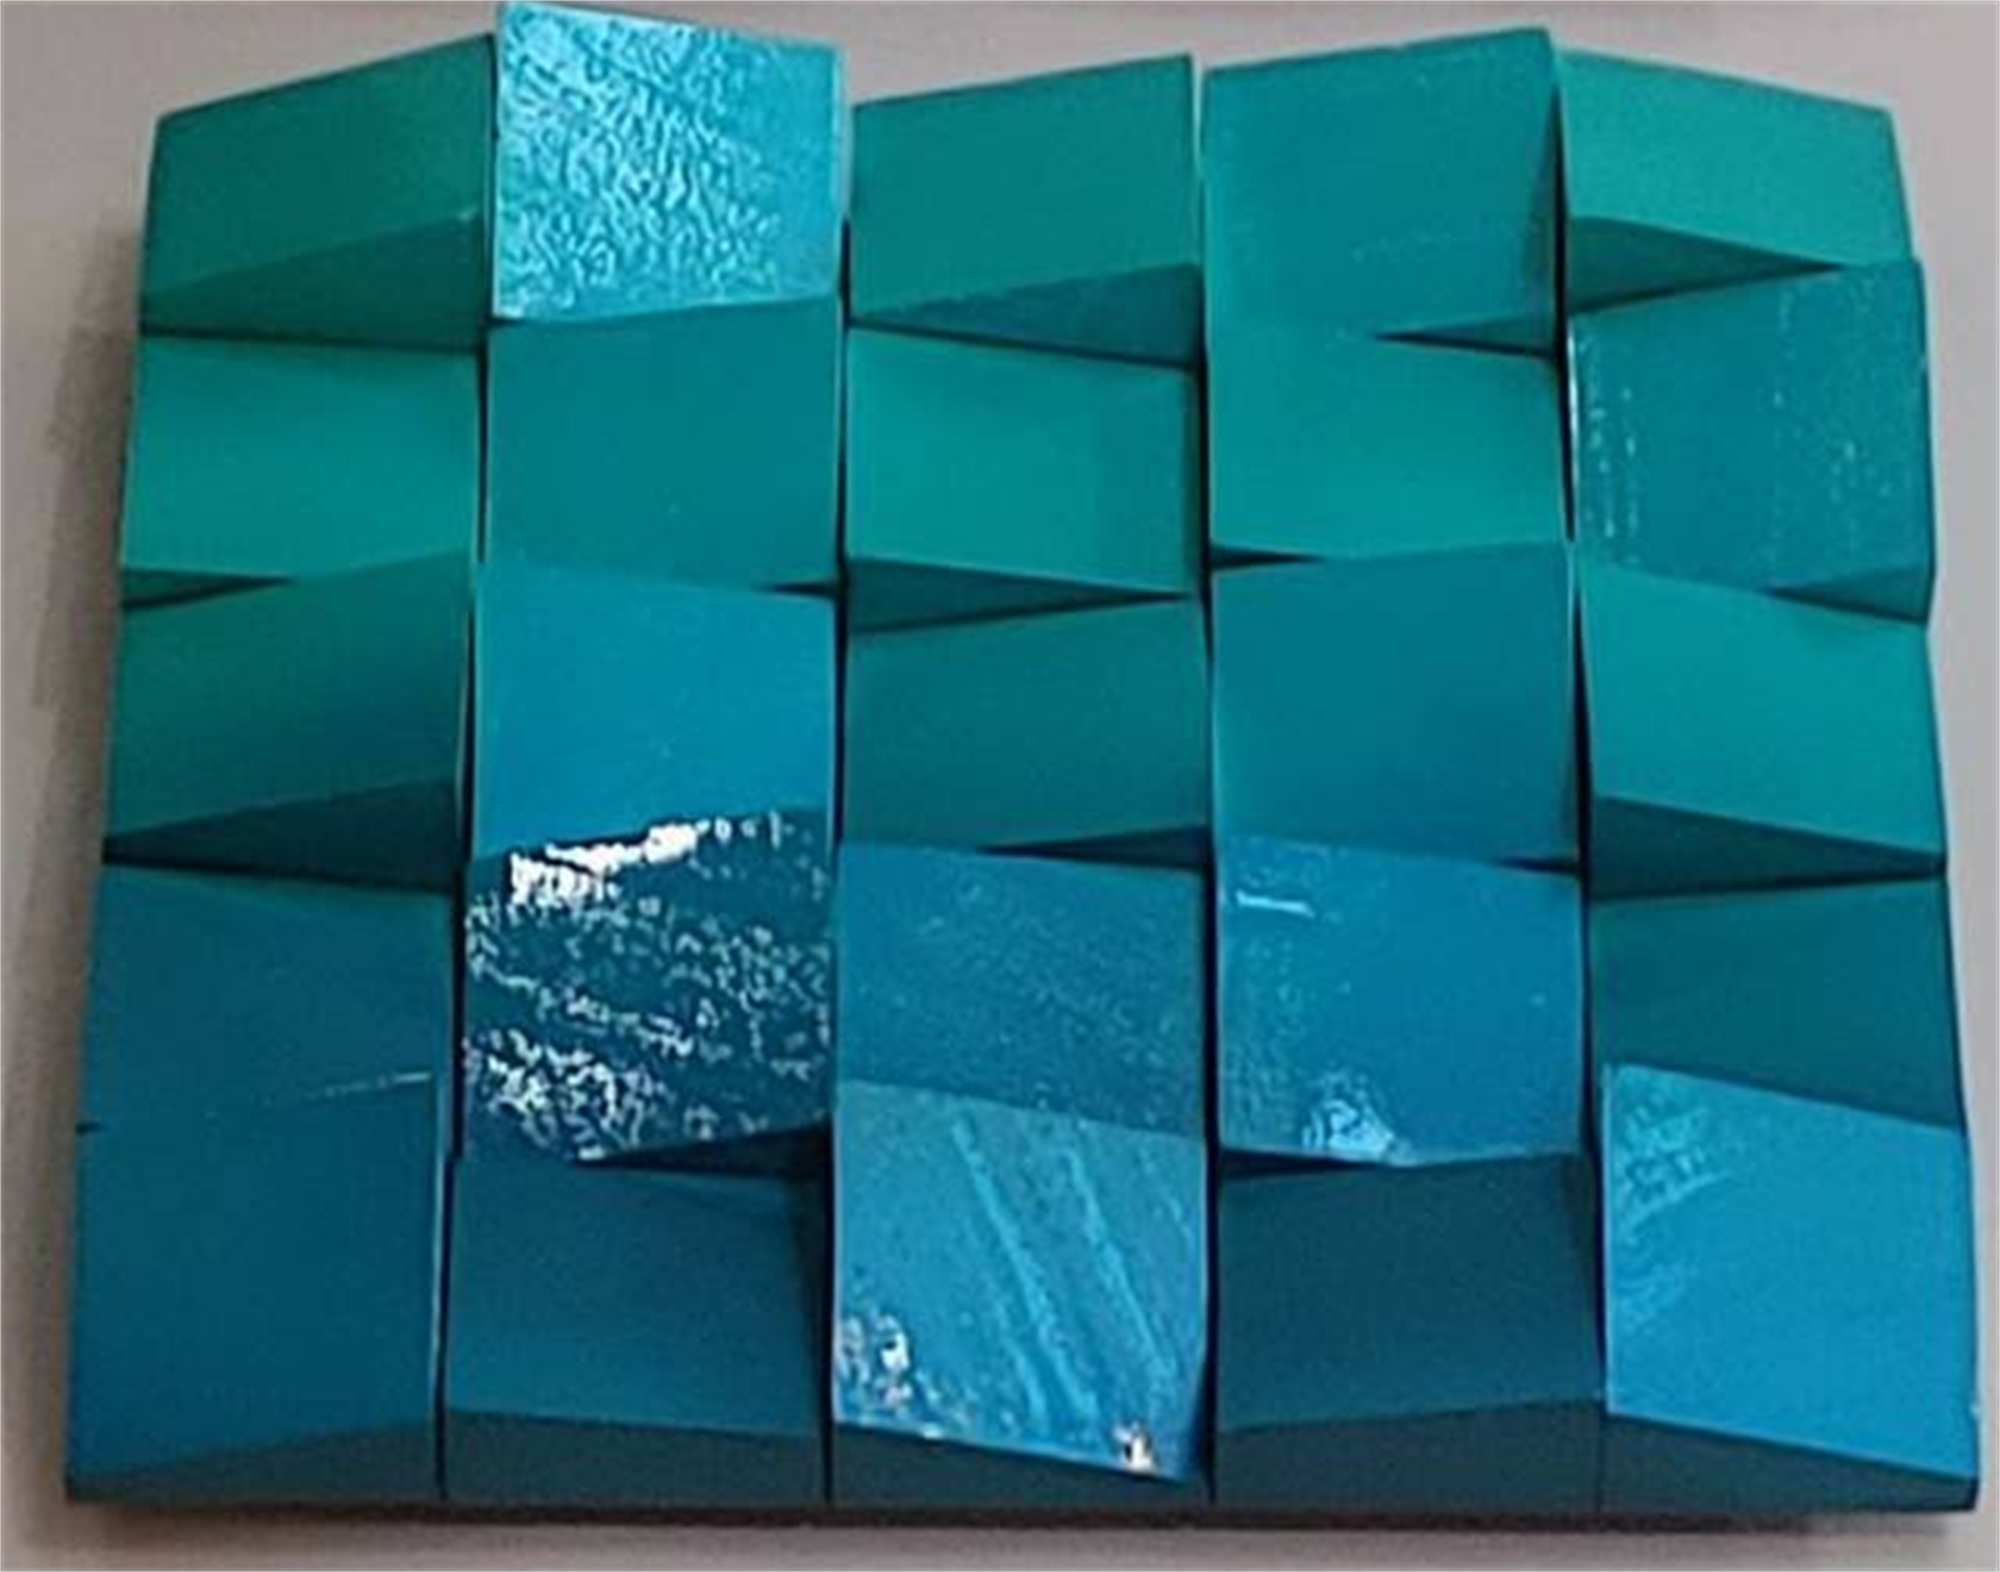 Neon Waves Teal/Ombre by Efi Mashiah